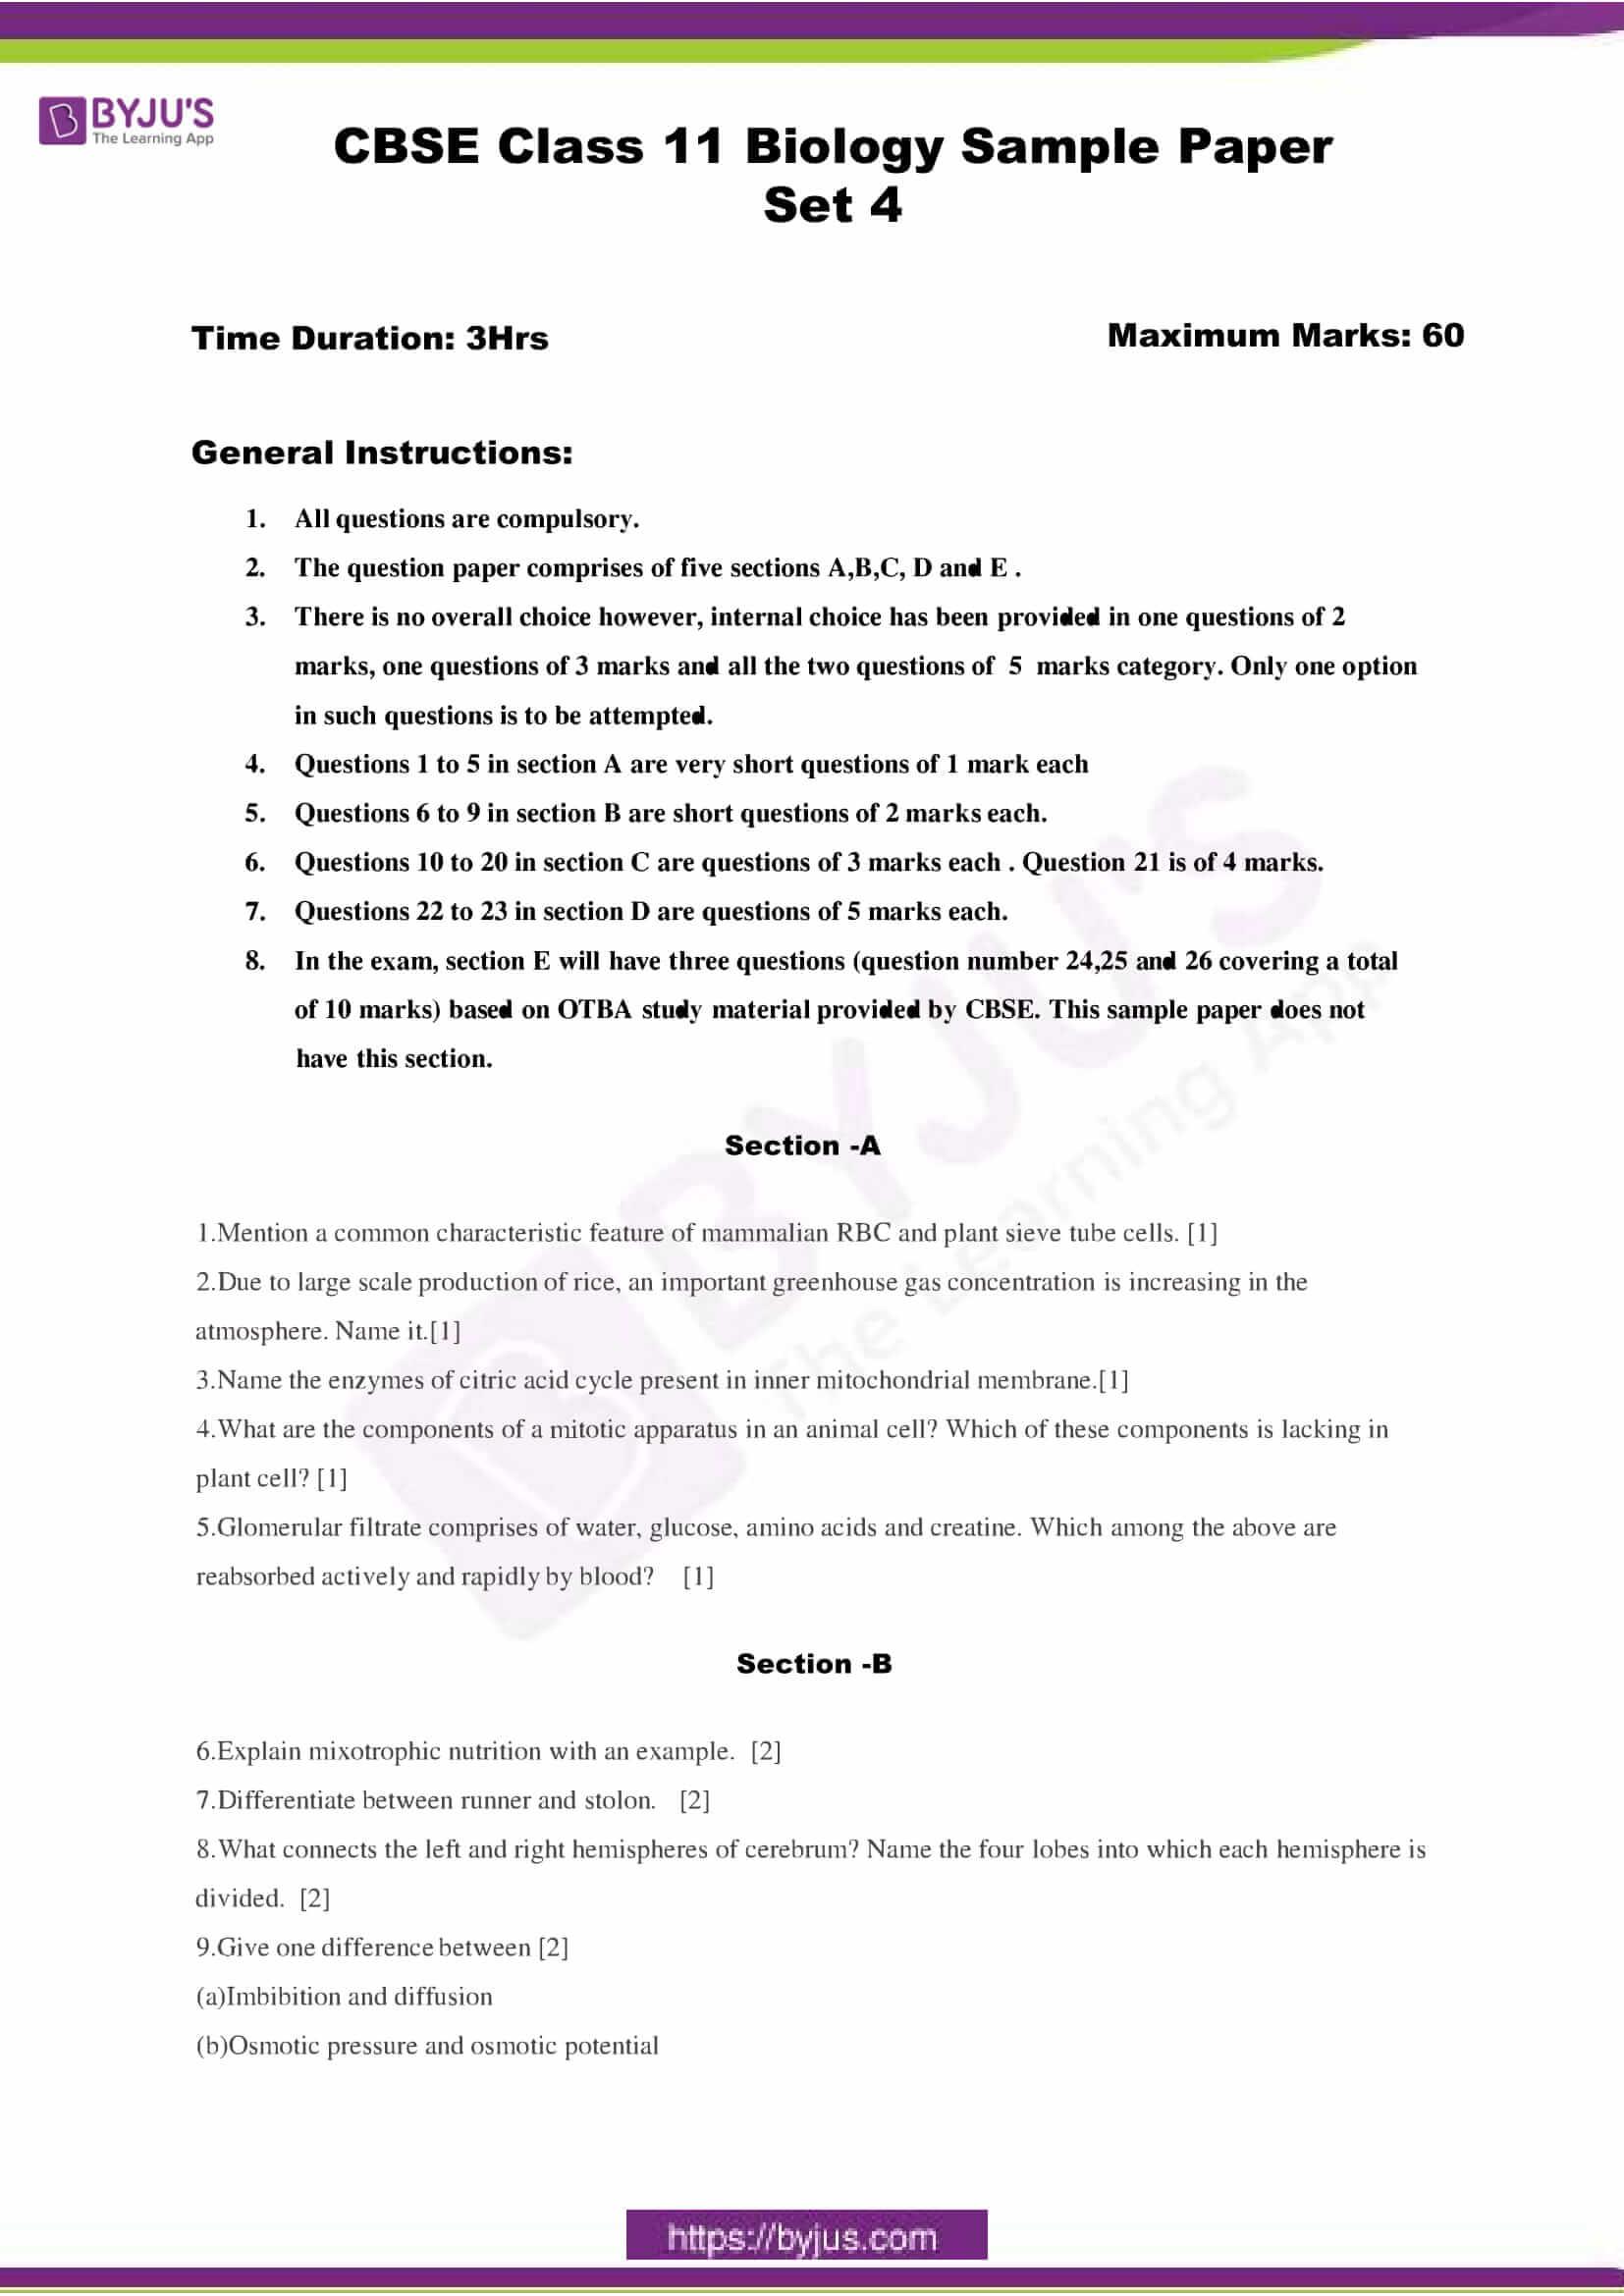 cbse class 11 bio sample paper set 4